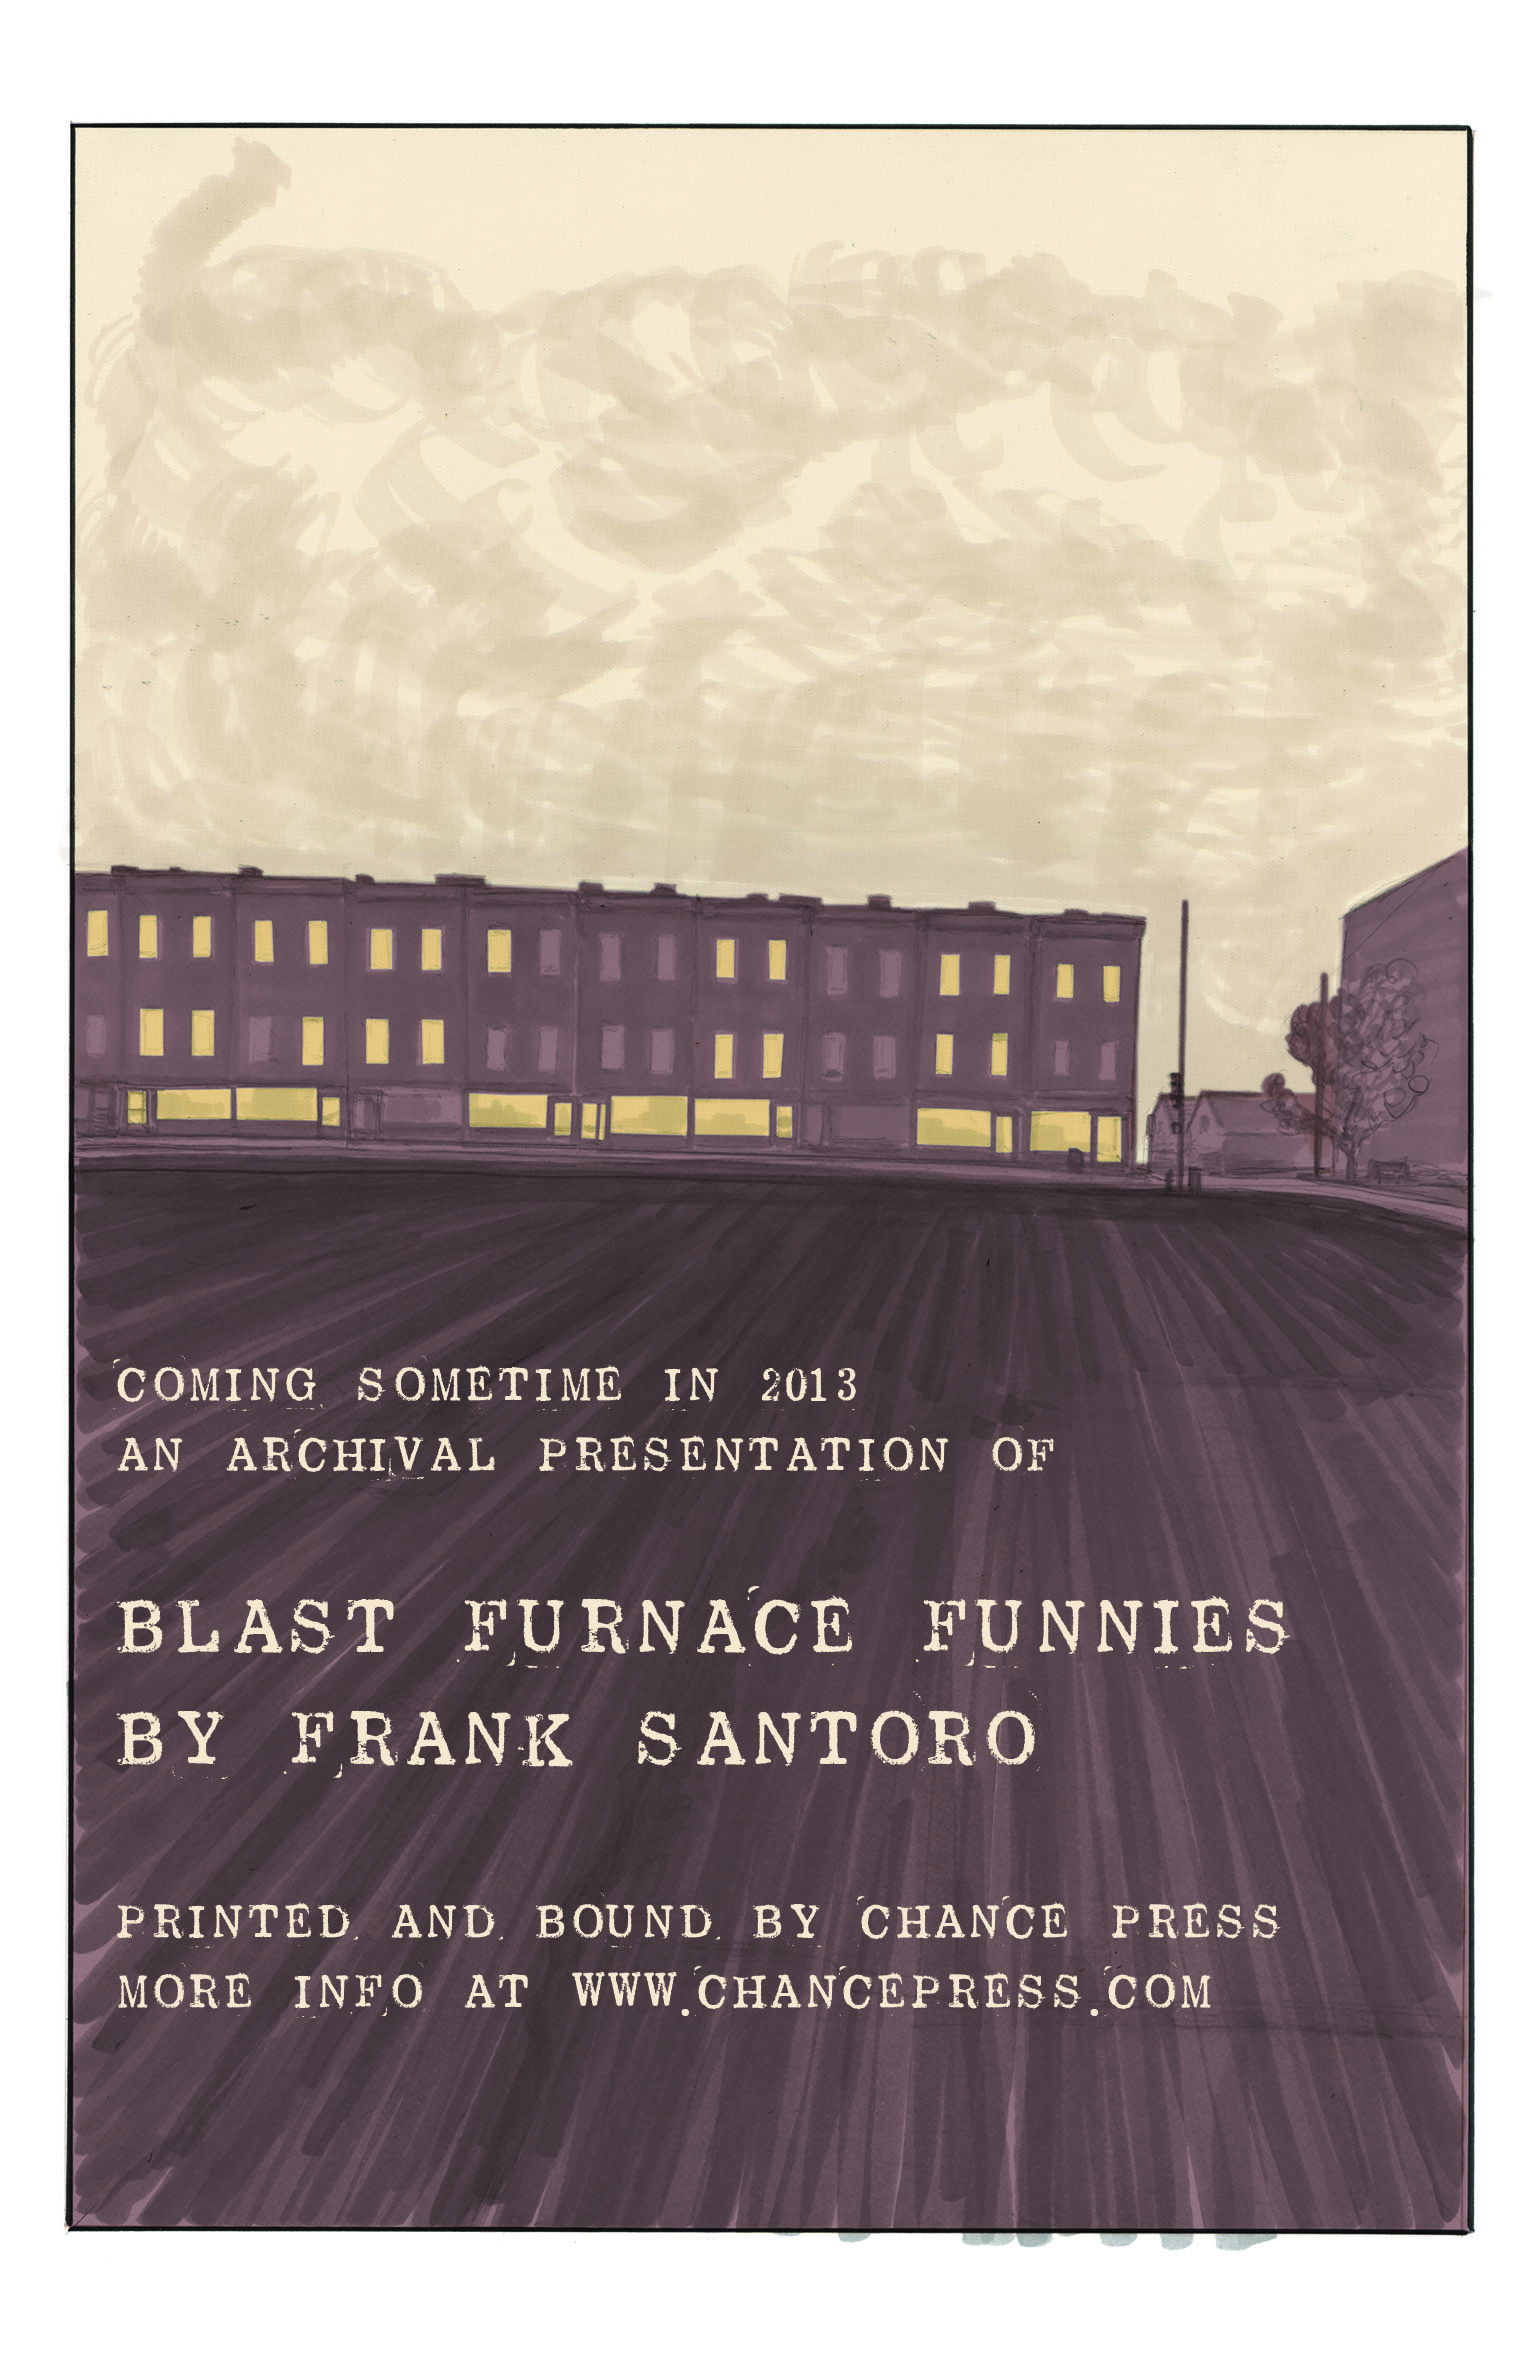 BlastFurnace_page1.jpg